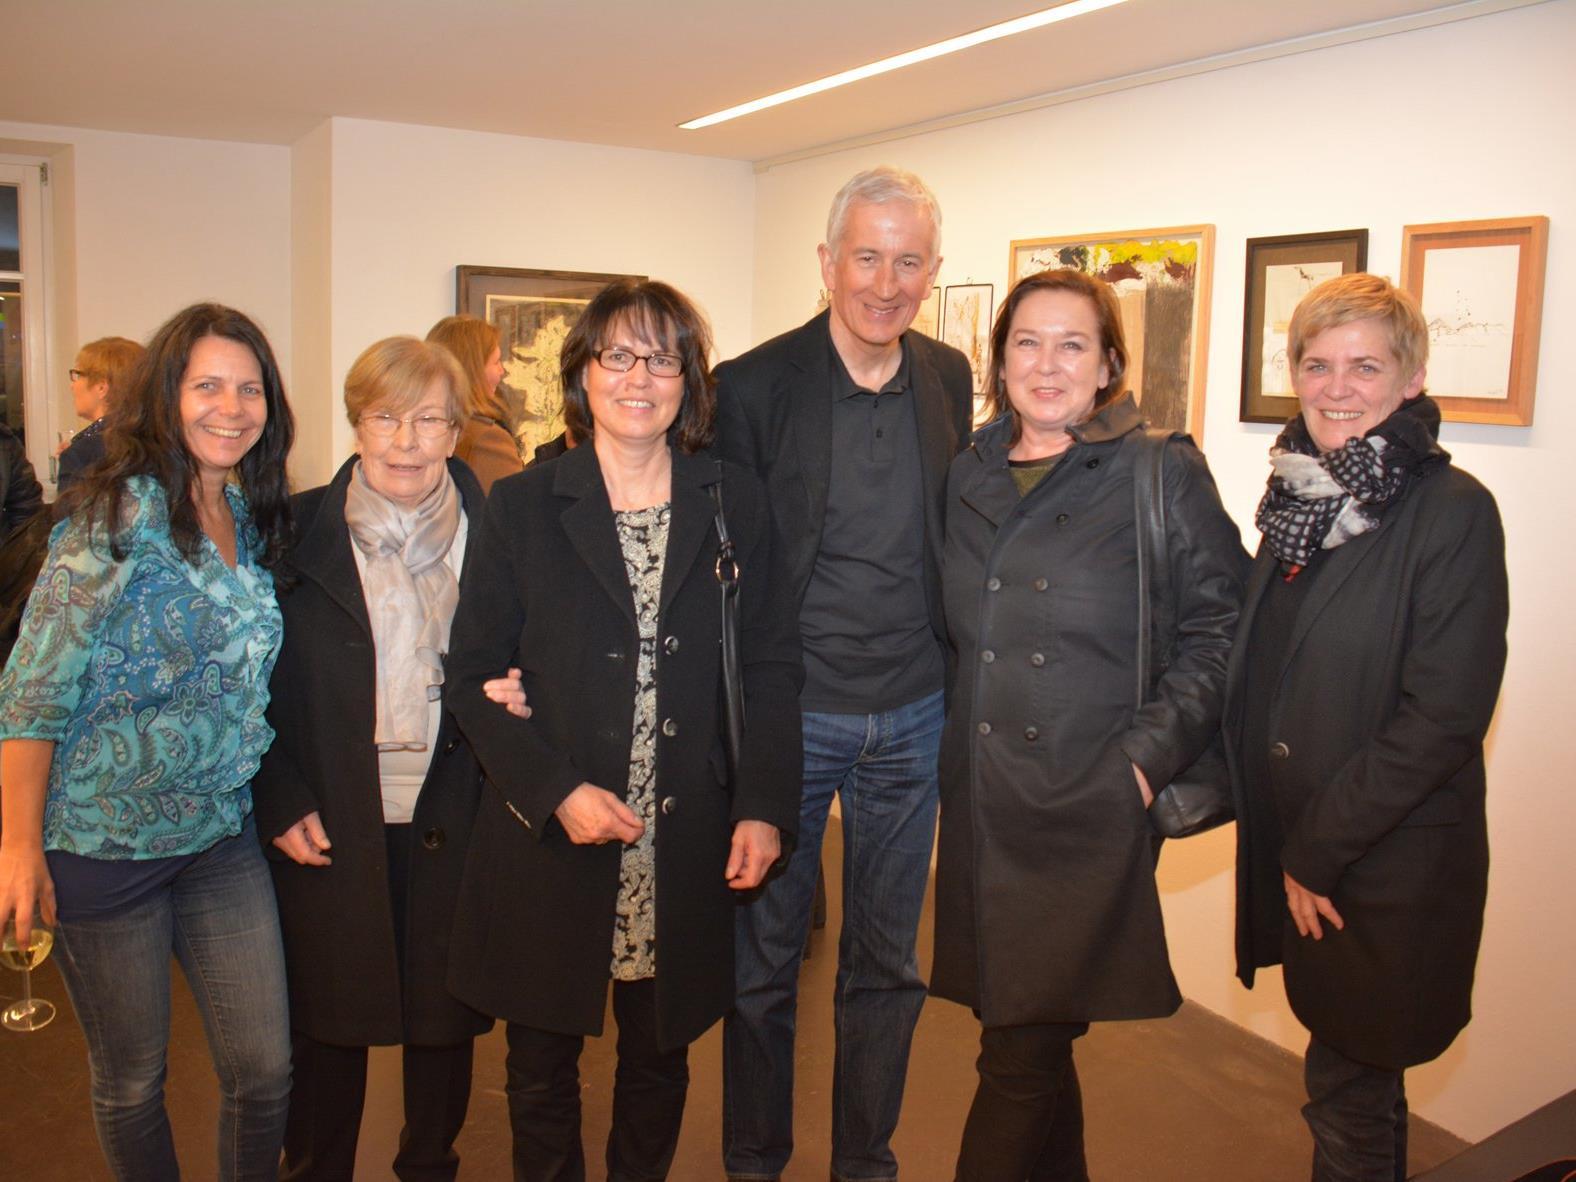 Andrea Juriatti, Pia Köhlmeier, Sabine u. Wilfried Berchtold, Sabine Köhlmeier u. Andrea Romagna